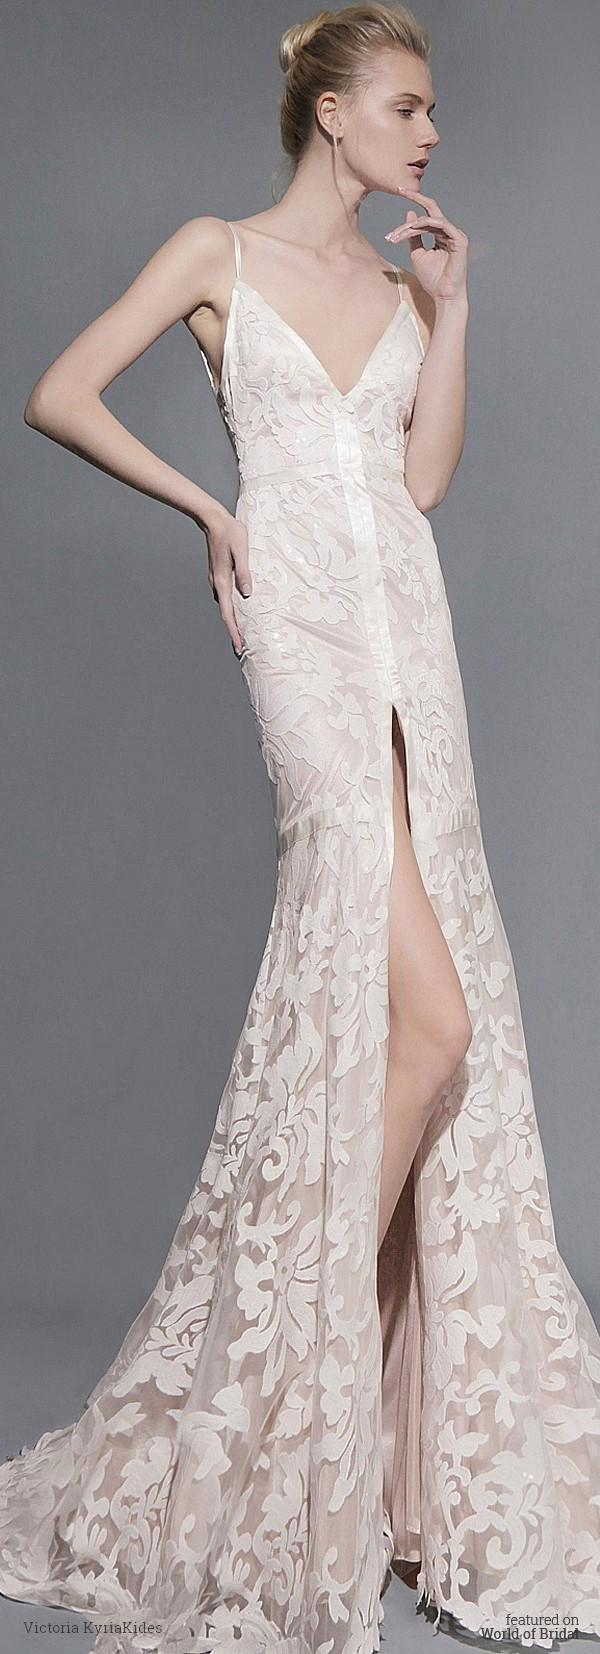 Wedding - Victoria KyriaKides Spring 2016 Wedding Dresses